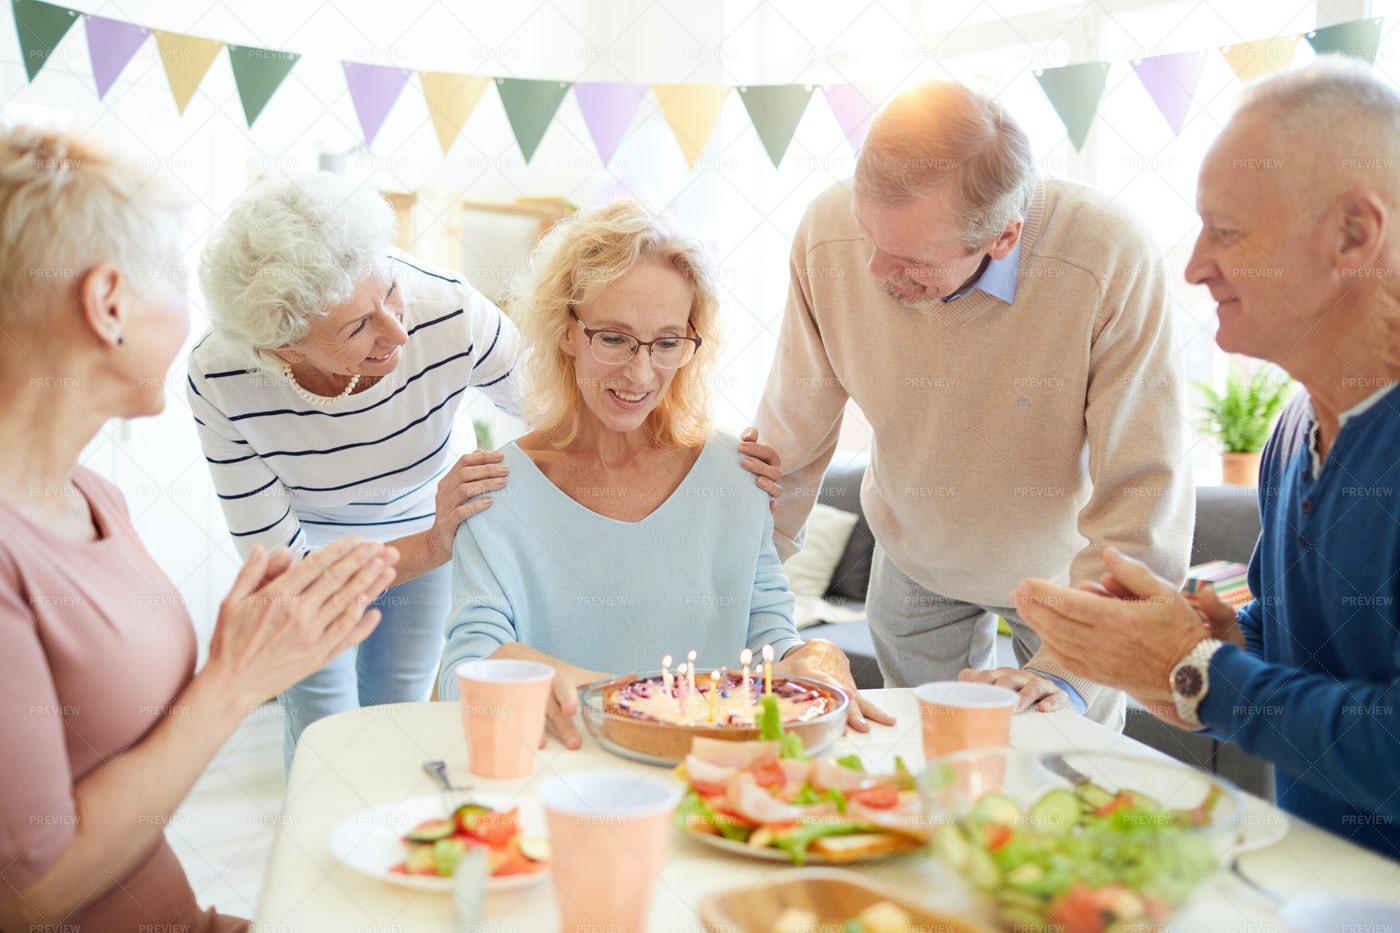 Sweet Cake For Birthday Woman: Stock Photos